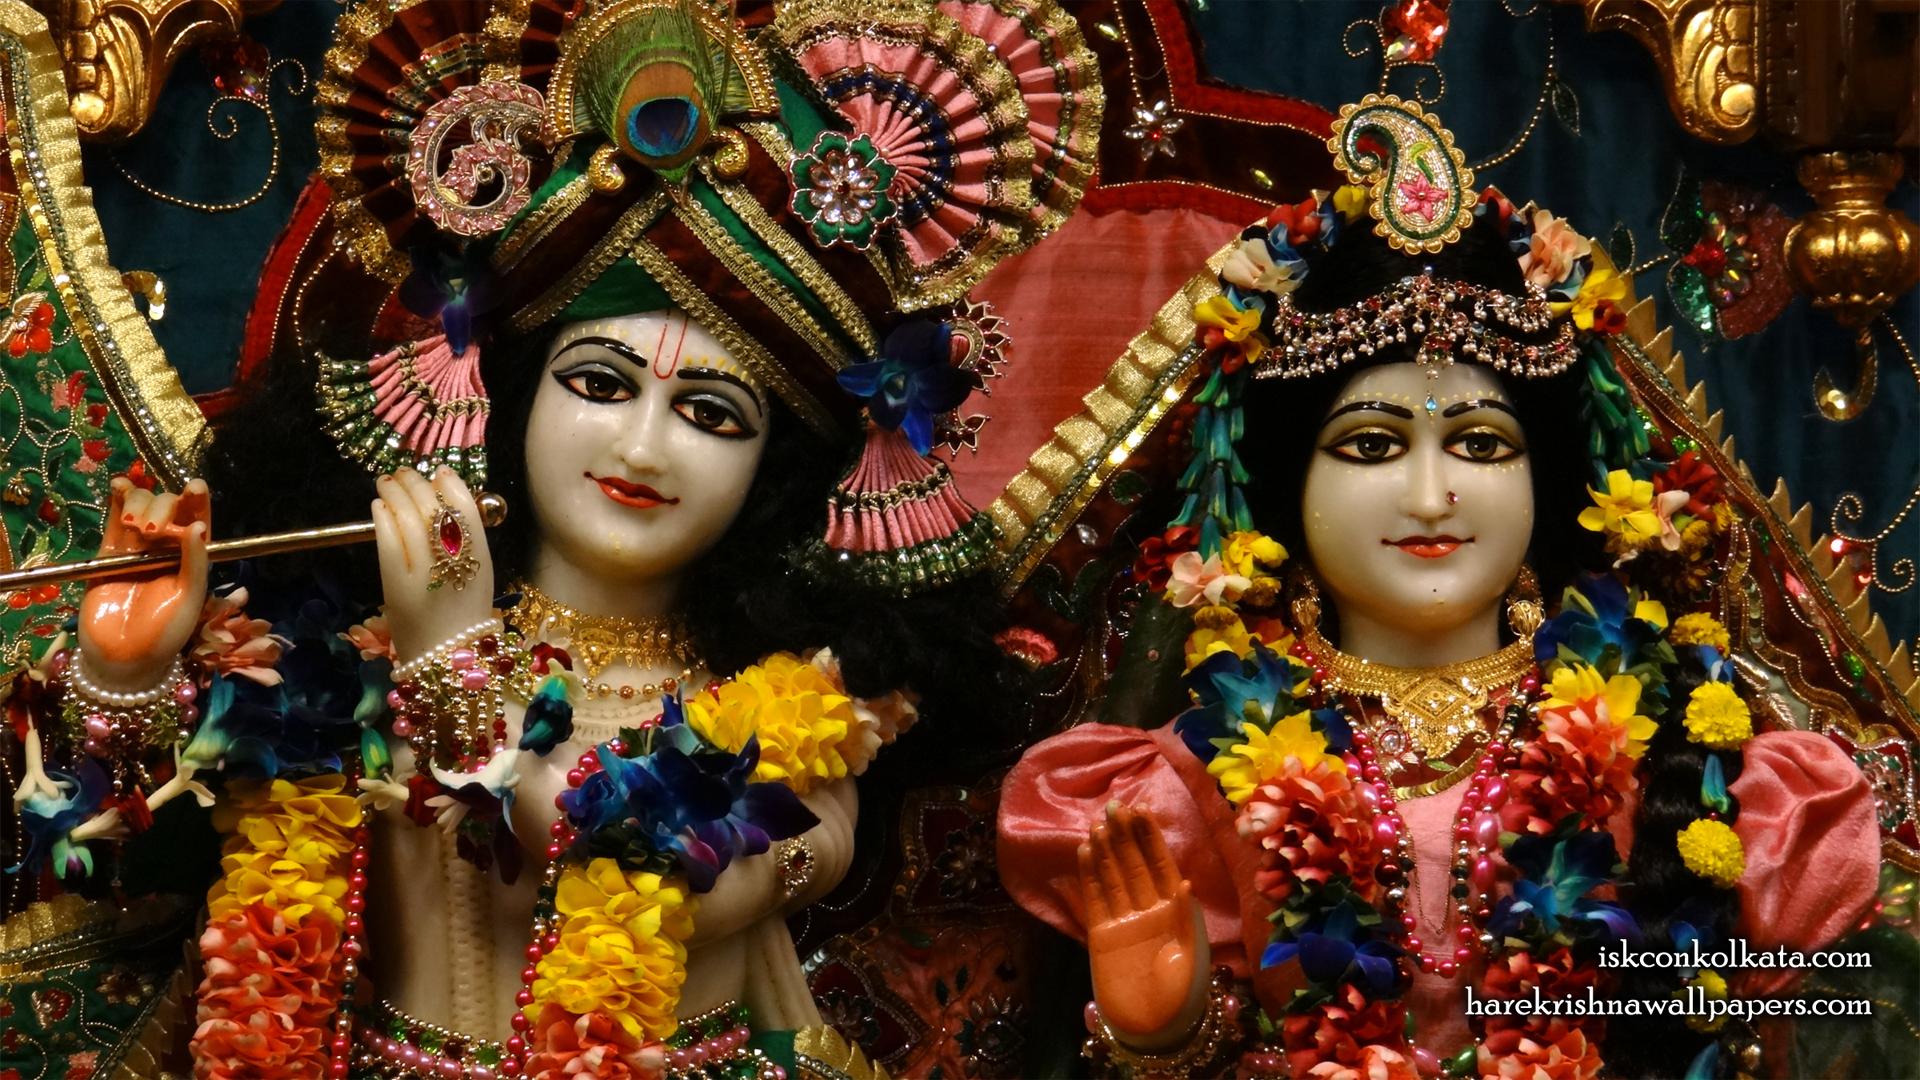 Sri Sri Radha Govinda Close up Wallpaper (010) Size 1920x1080 Download